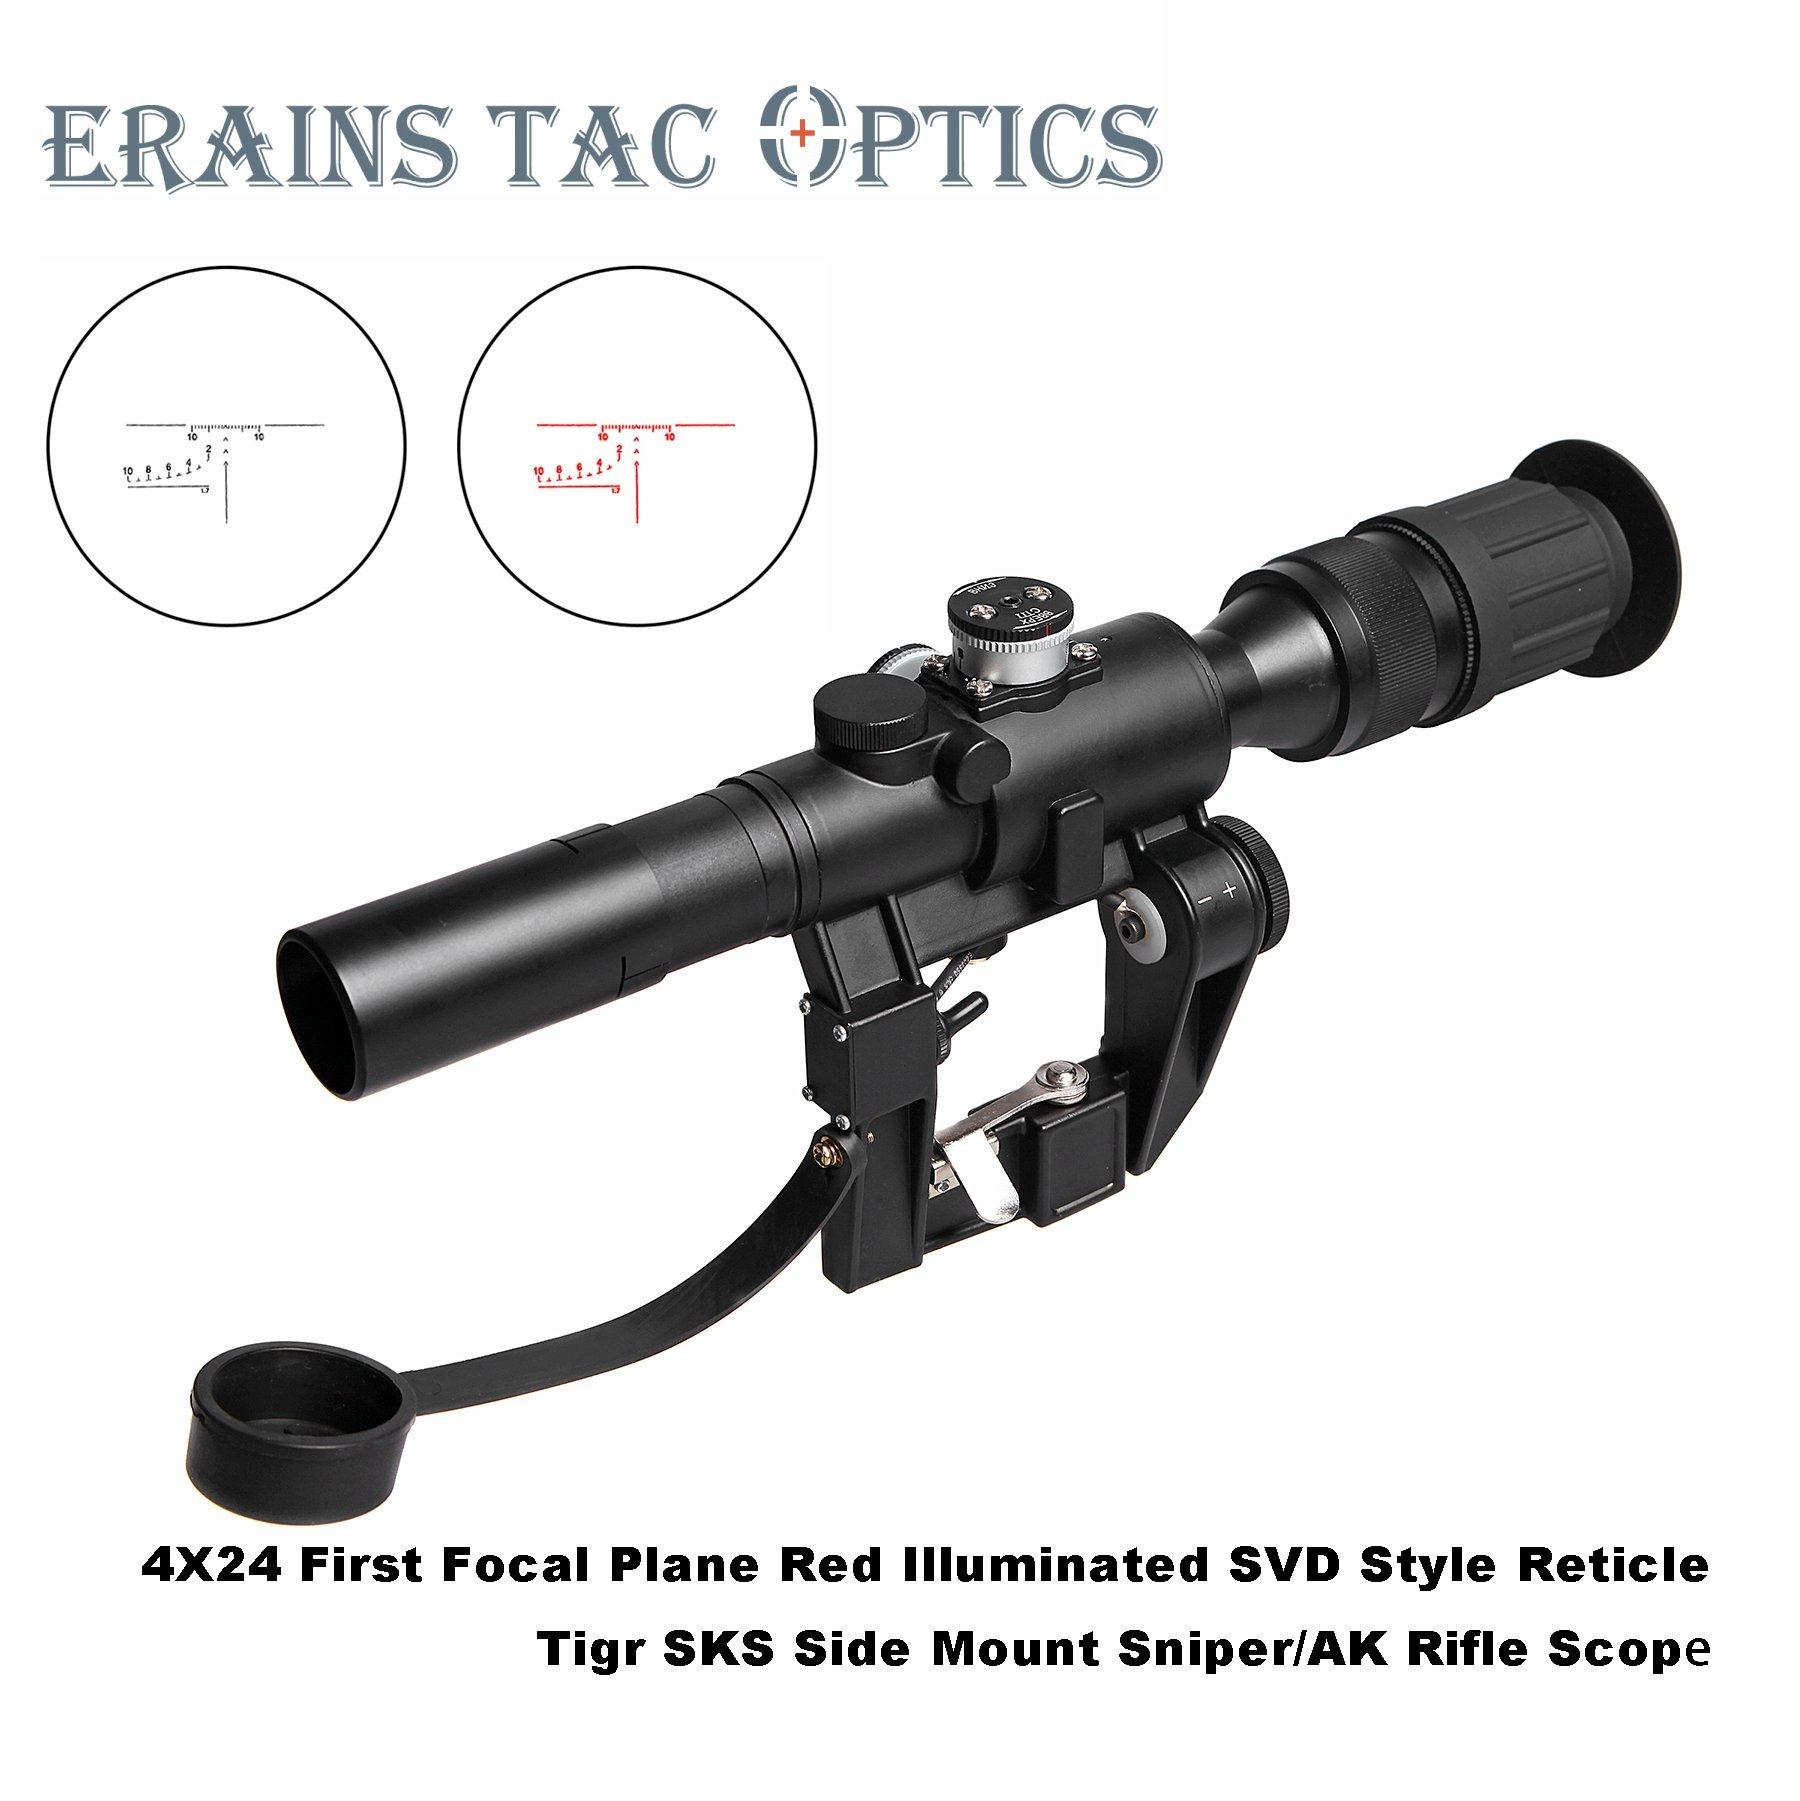 [Hot Item] Dragunov Sniper Rifle Scope Svd 4X24 Red Illuminated Ffp Reticle  Ak47 Sks Side Mount Riflescope